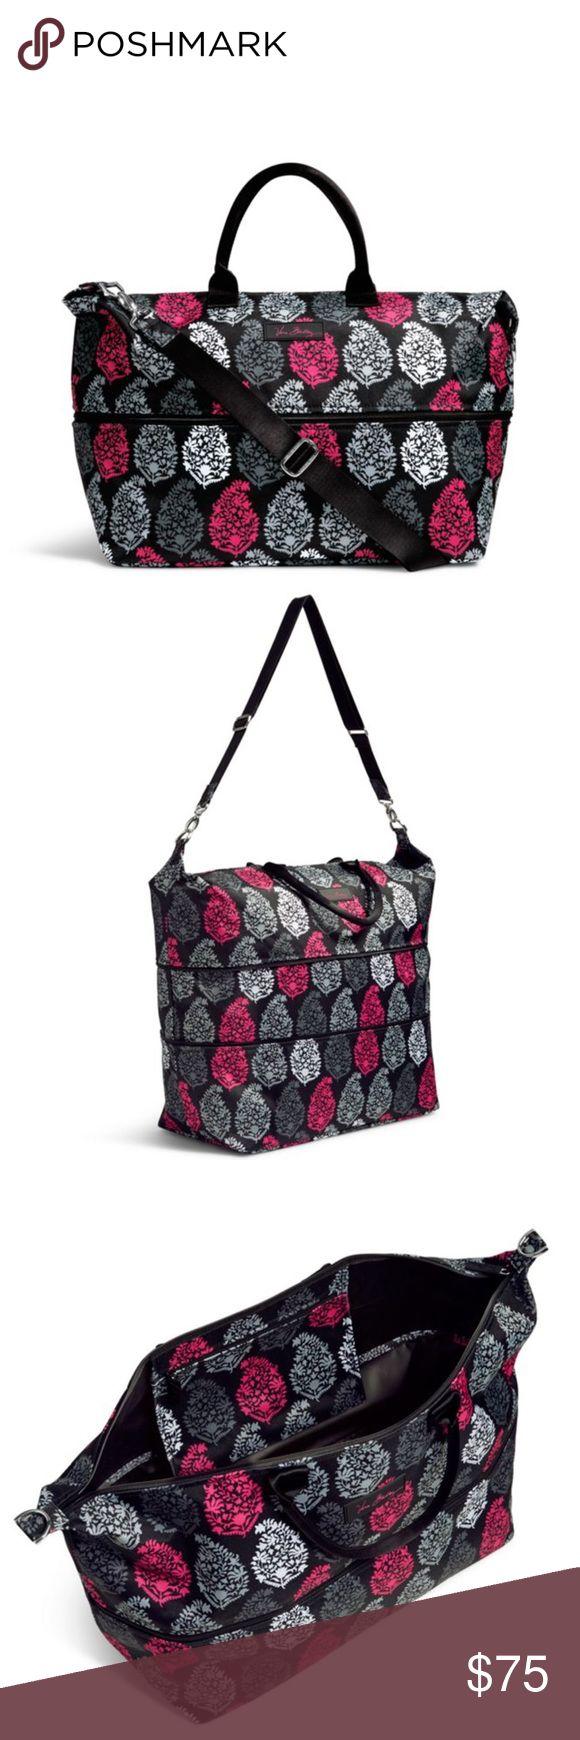 ❄️Winter Sale❄️ New Vera Bradley Travel Bag New with tags Vera Bradley large Travel Bag in northern lights Vera Bradley Bags Travel Bags